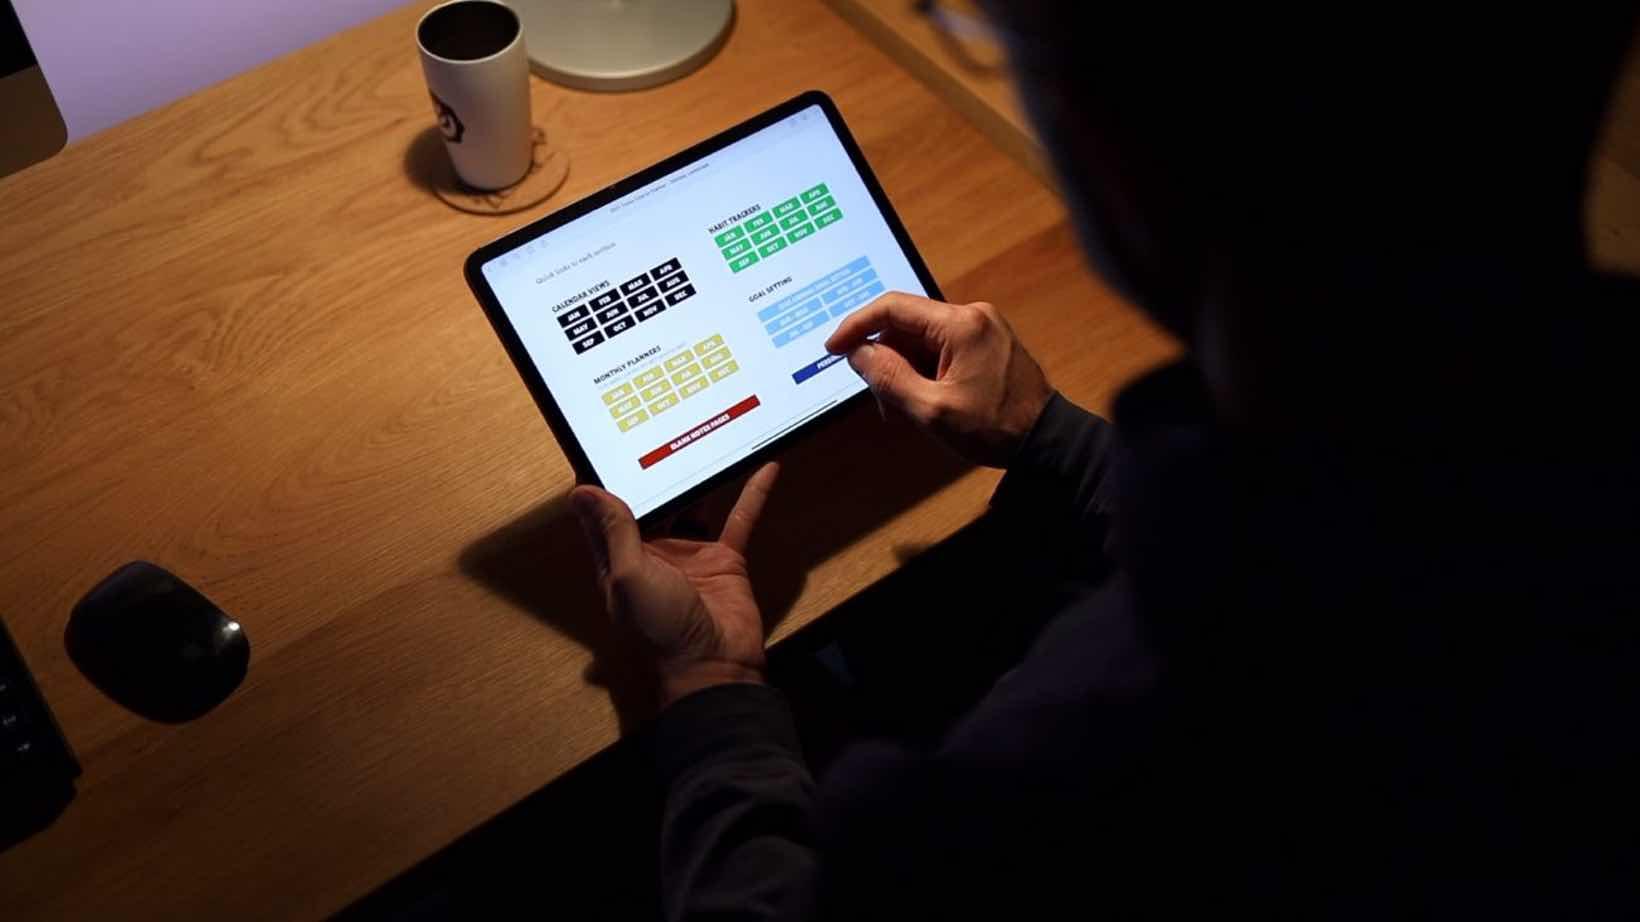 The 2021 Digital Planner